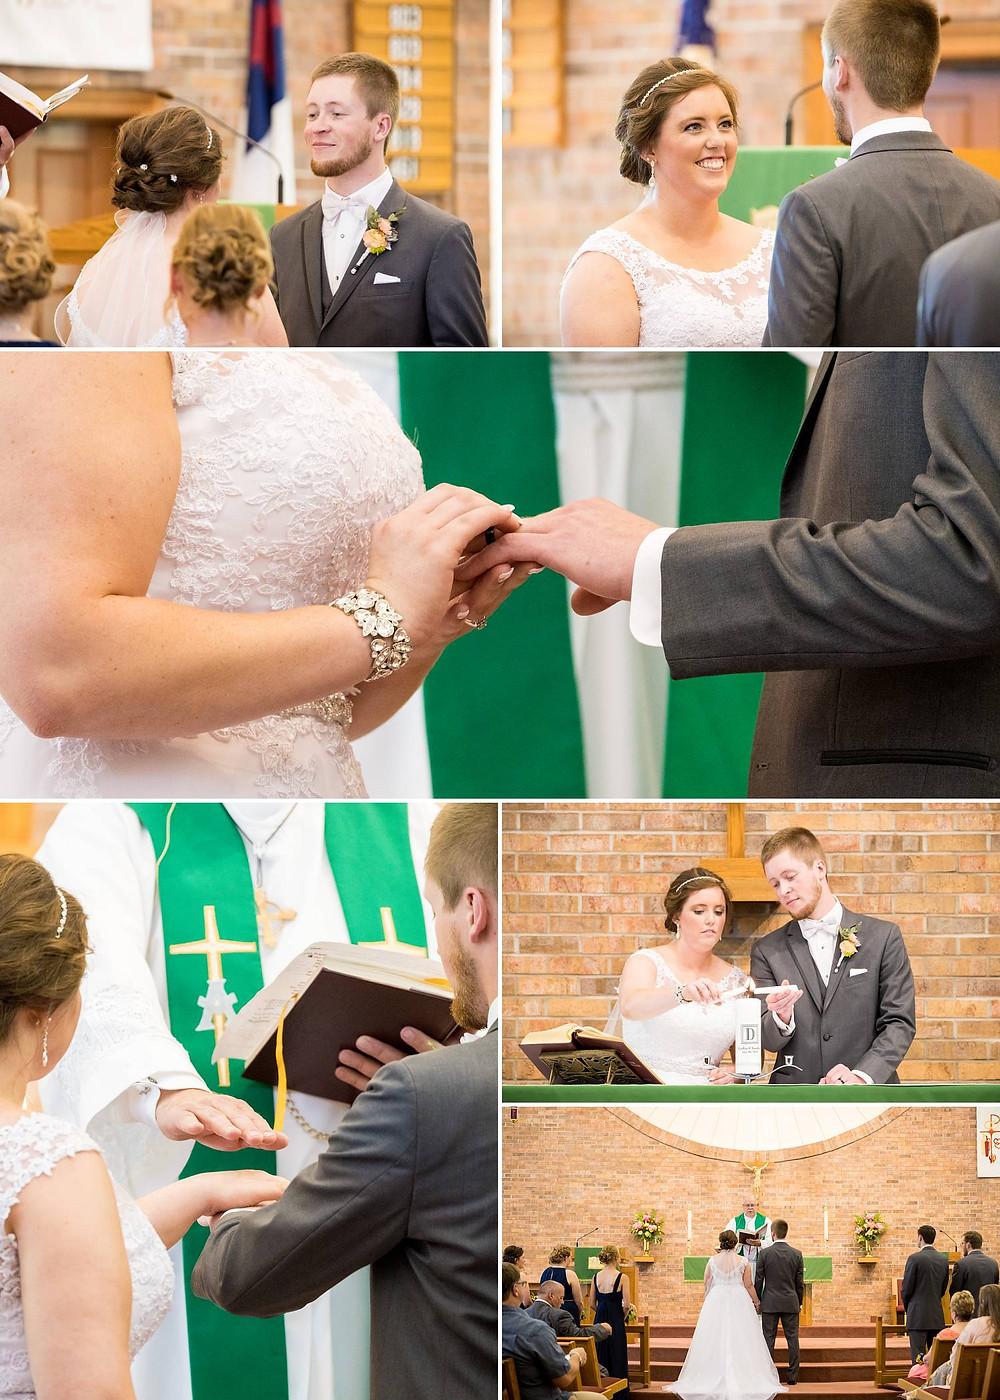 Oshkosh Wisconsin June Wedding Ceremony   Lanari Photography